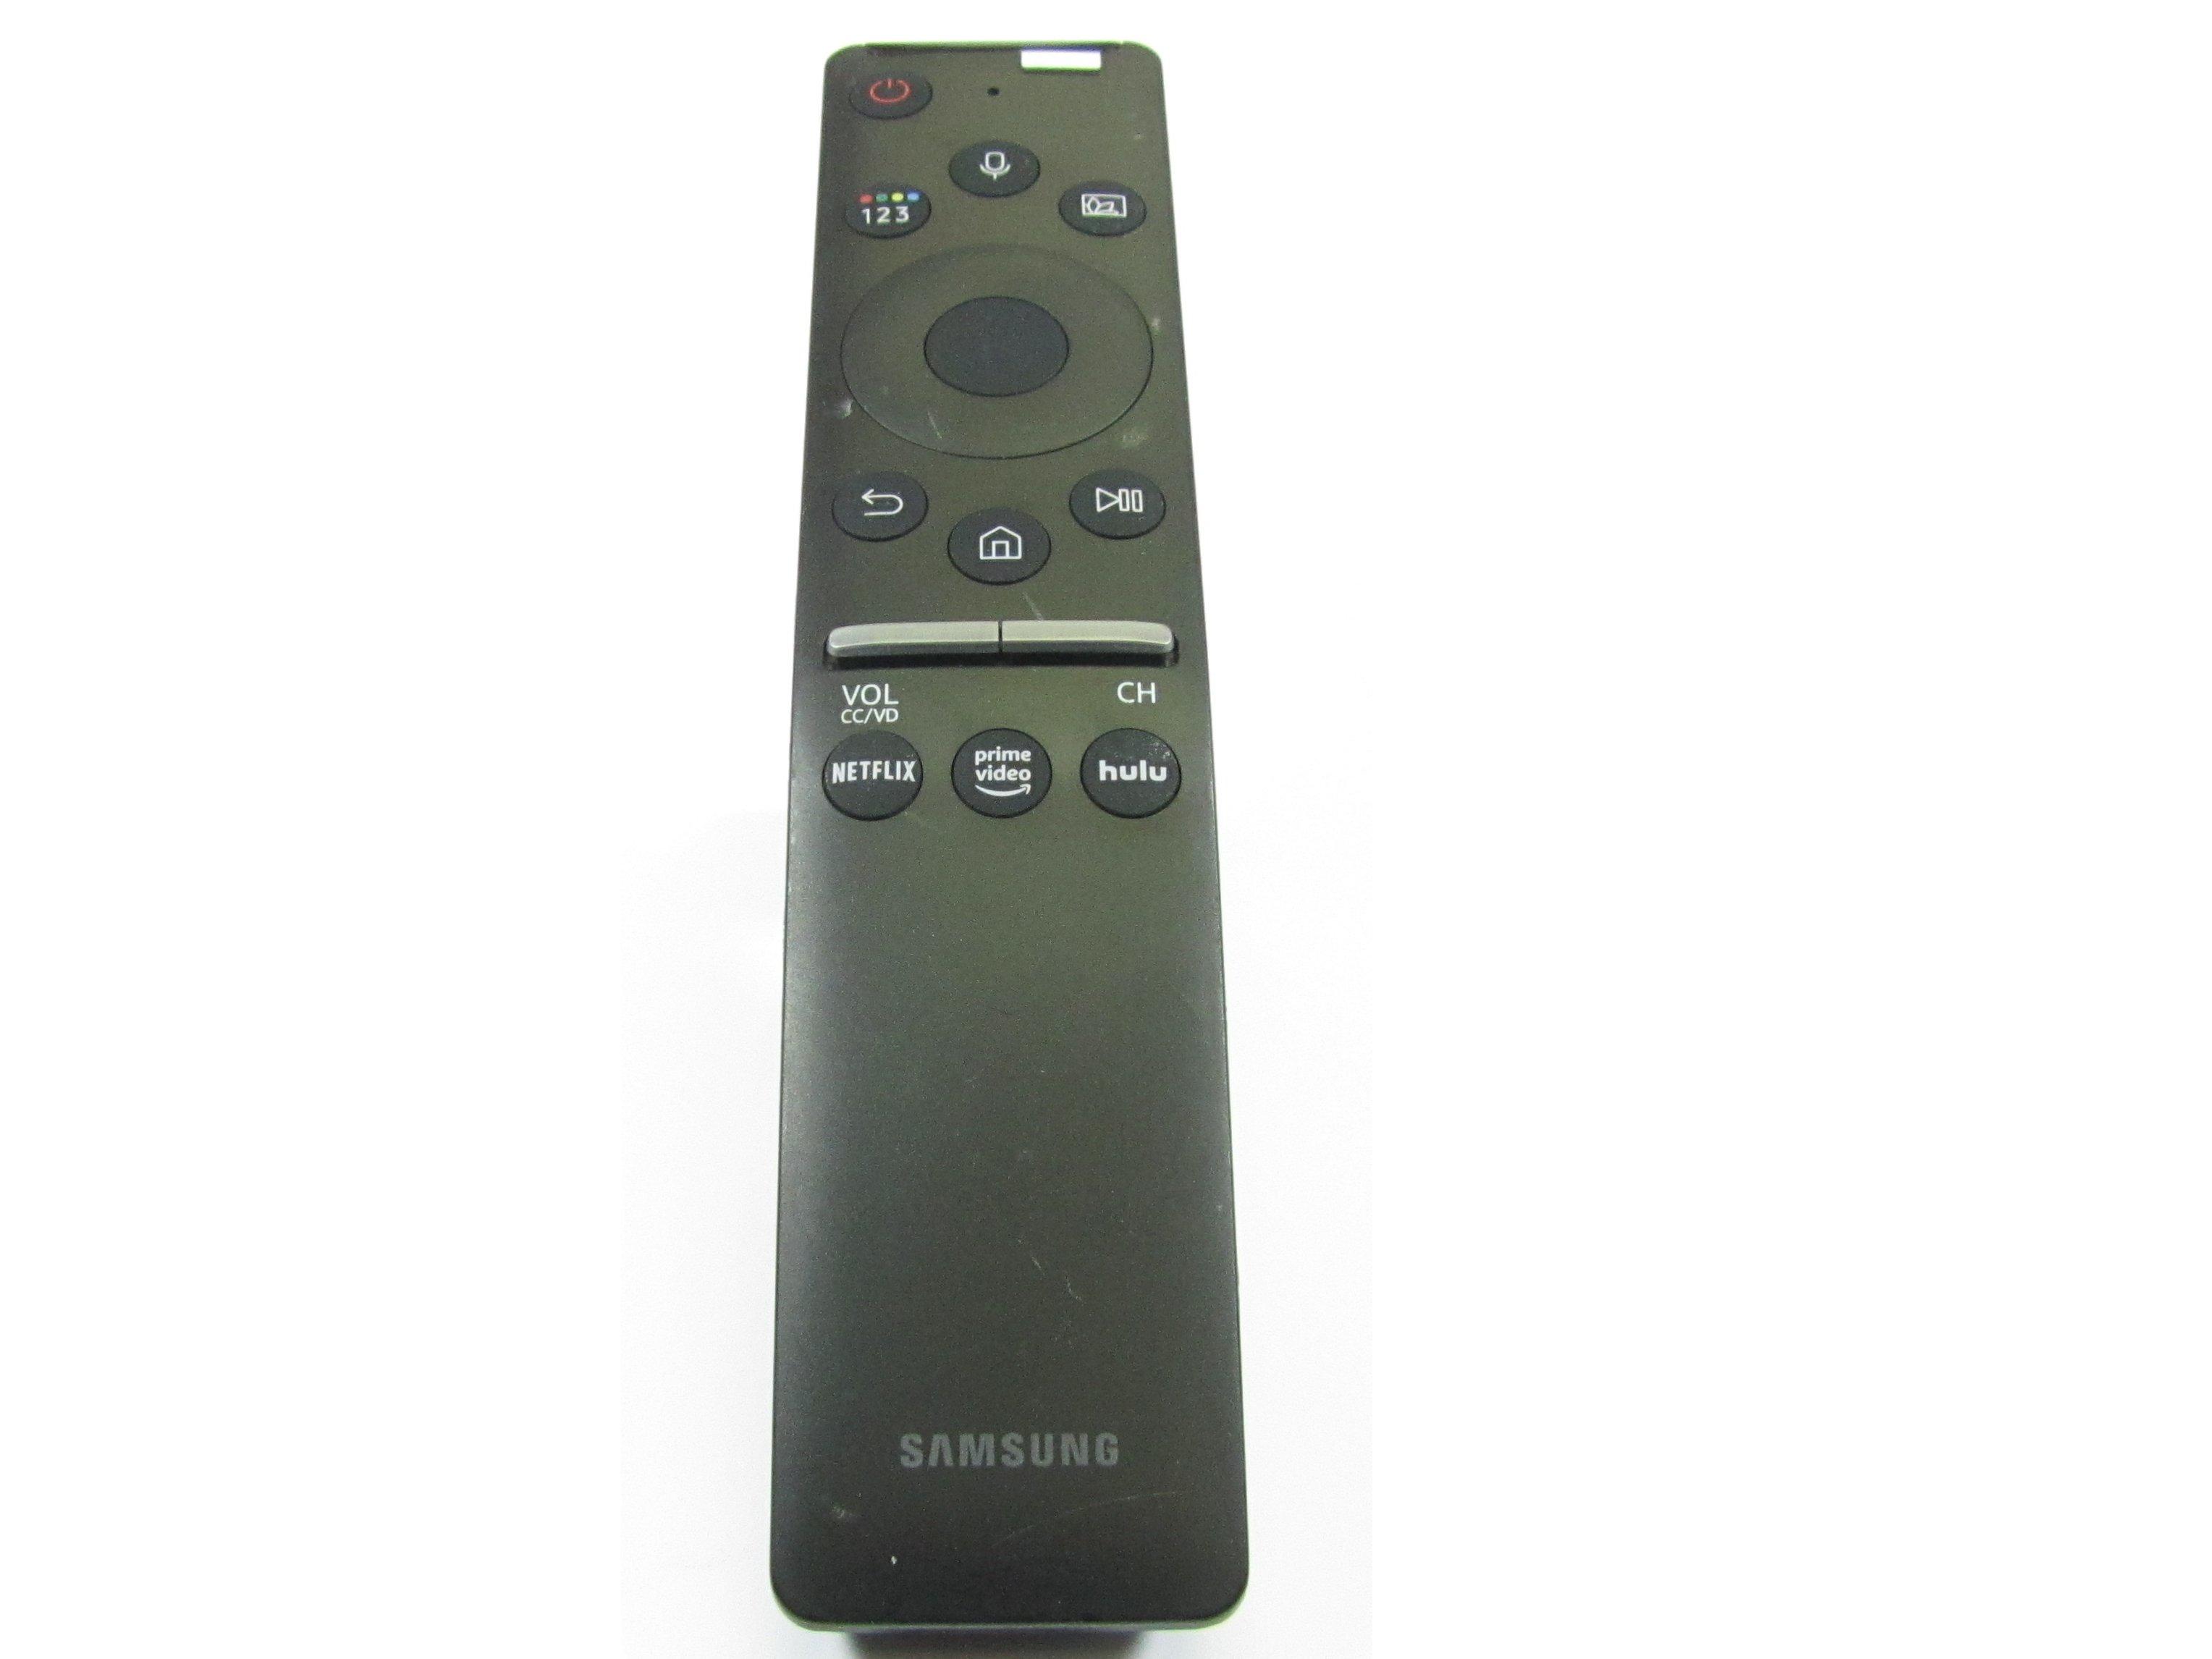 Samsung Qled Tv Smart Remote Teardown Ifixit